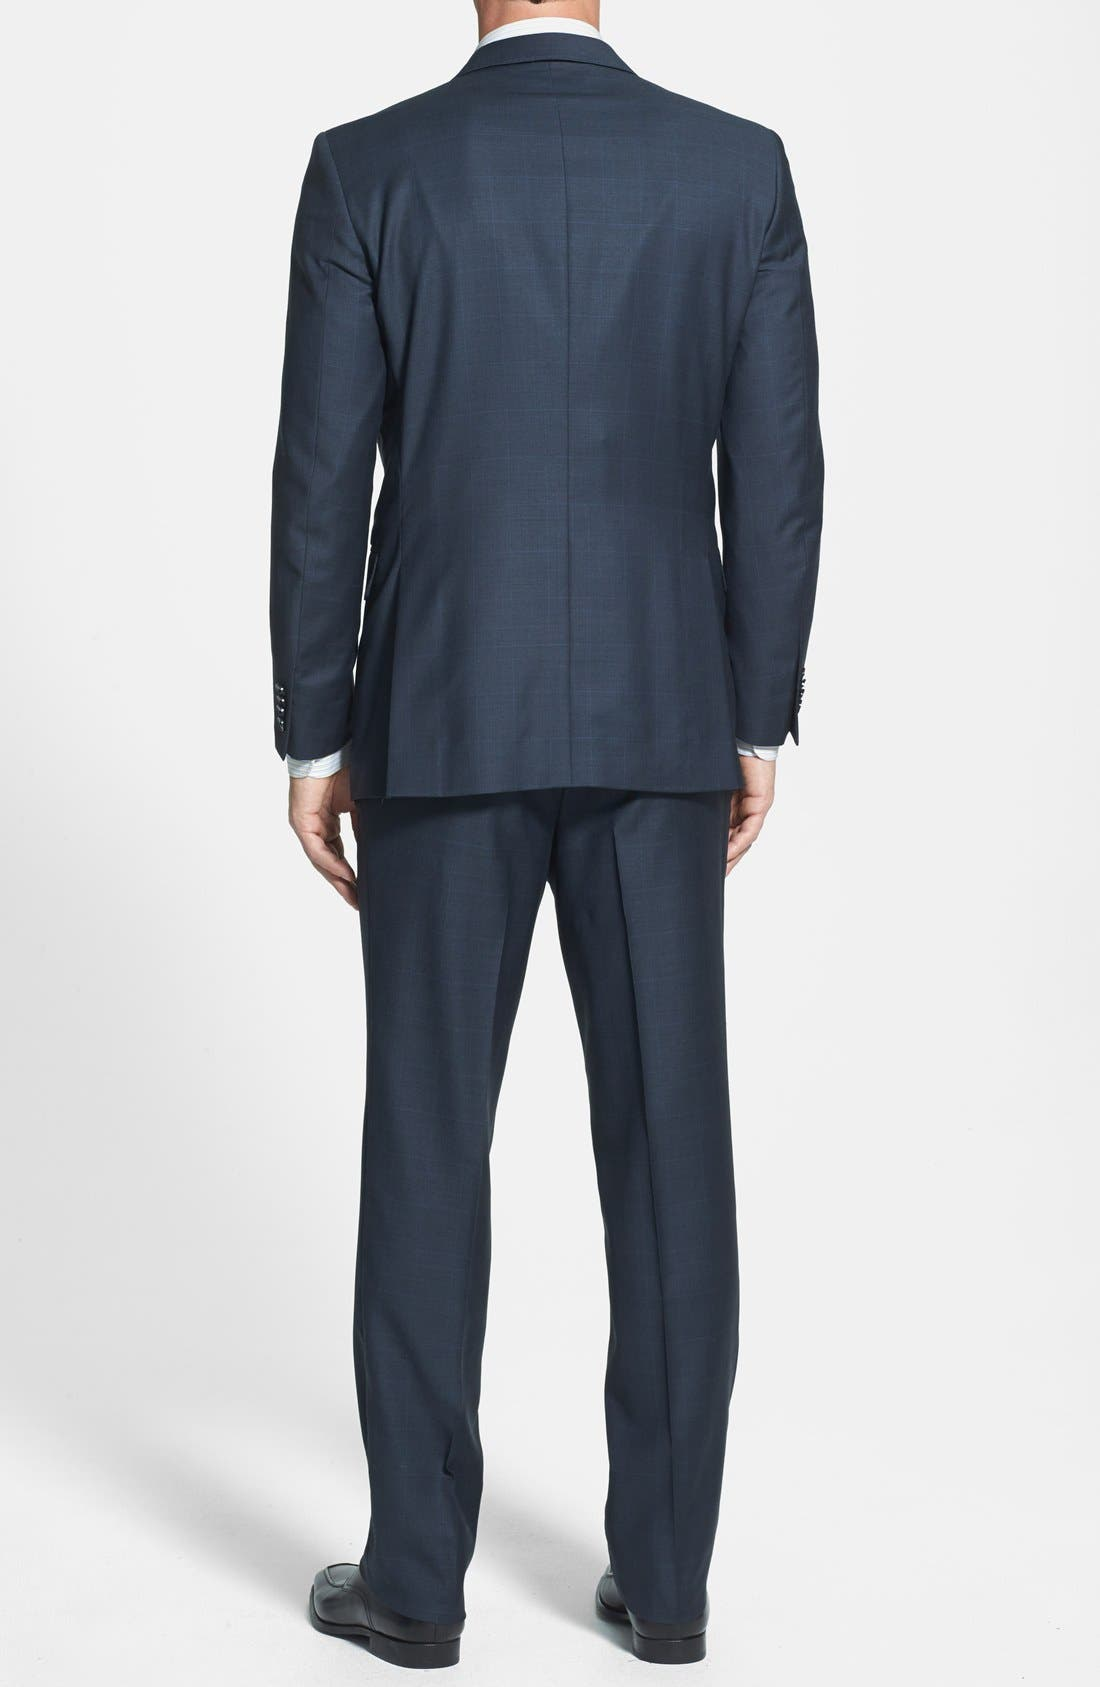 PETER MILLAR,                             Classic Fit Navy Windowpane Suit,                             Alternate thumbnail 4, color,                             410